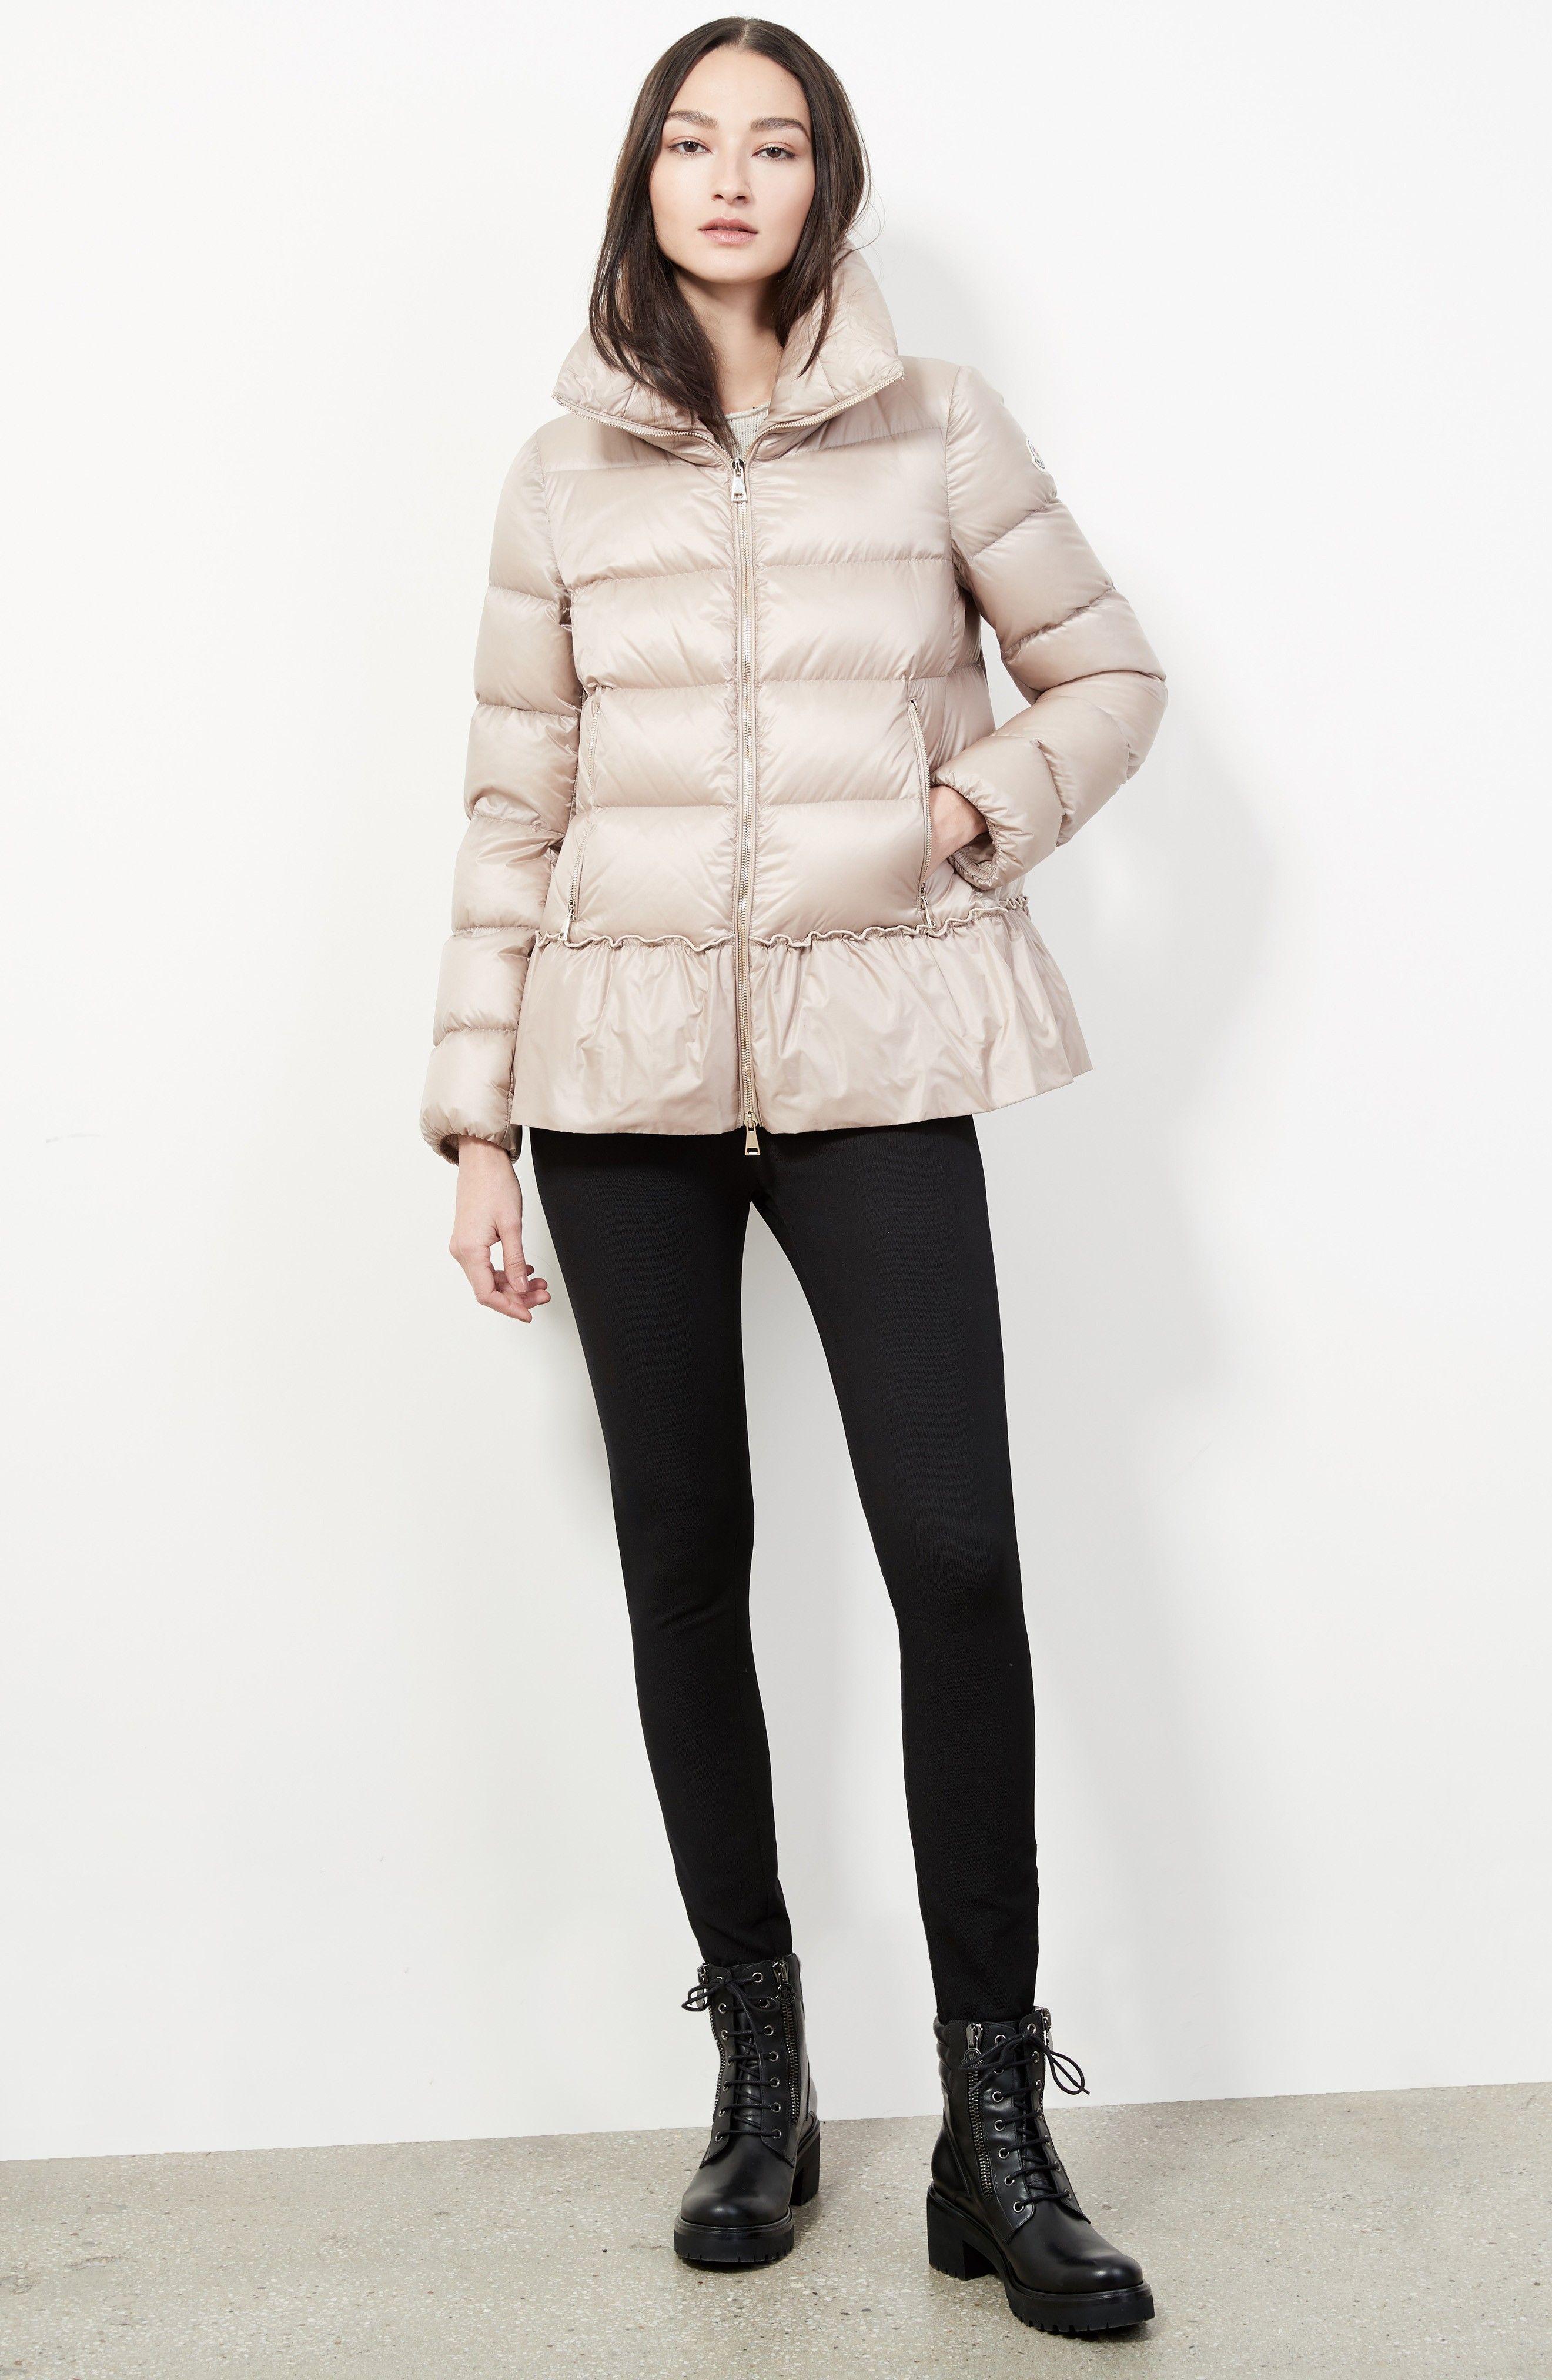 08b23ae33c61 reduced moncler jacket peplum anet 626c5 16a58